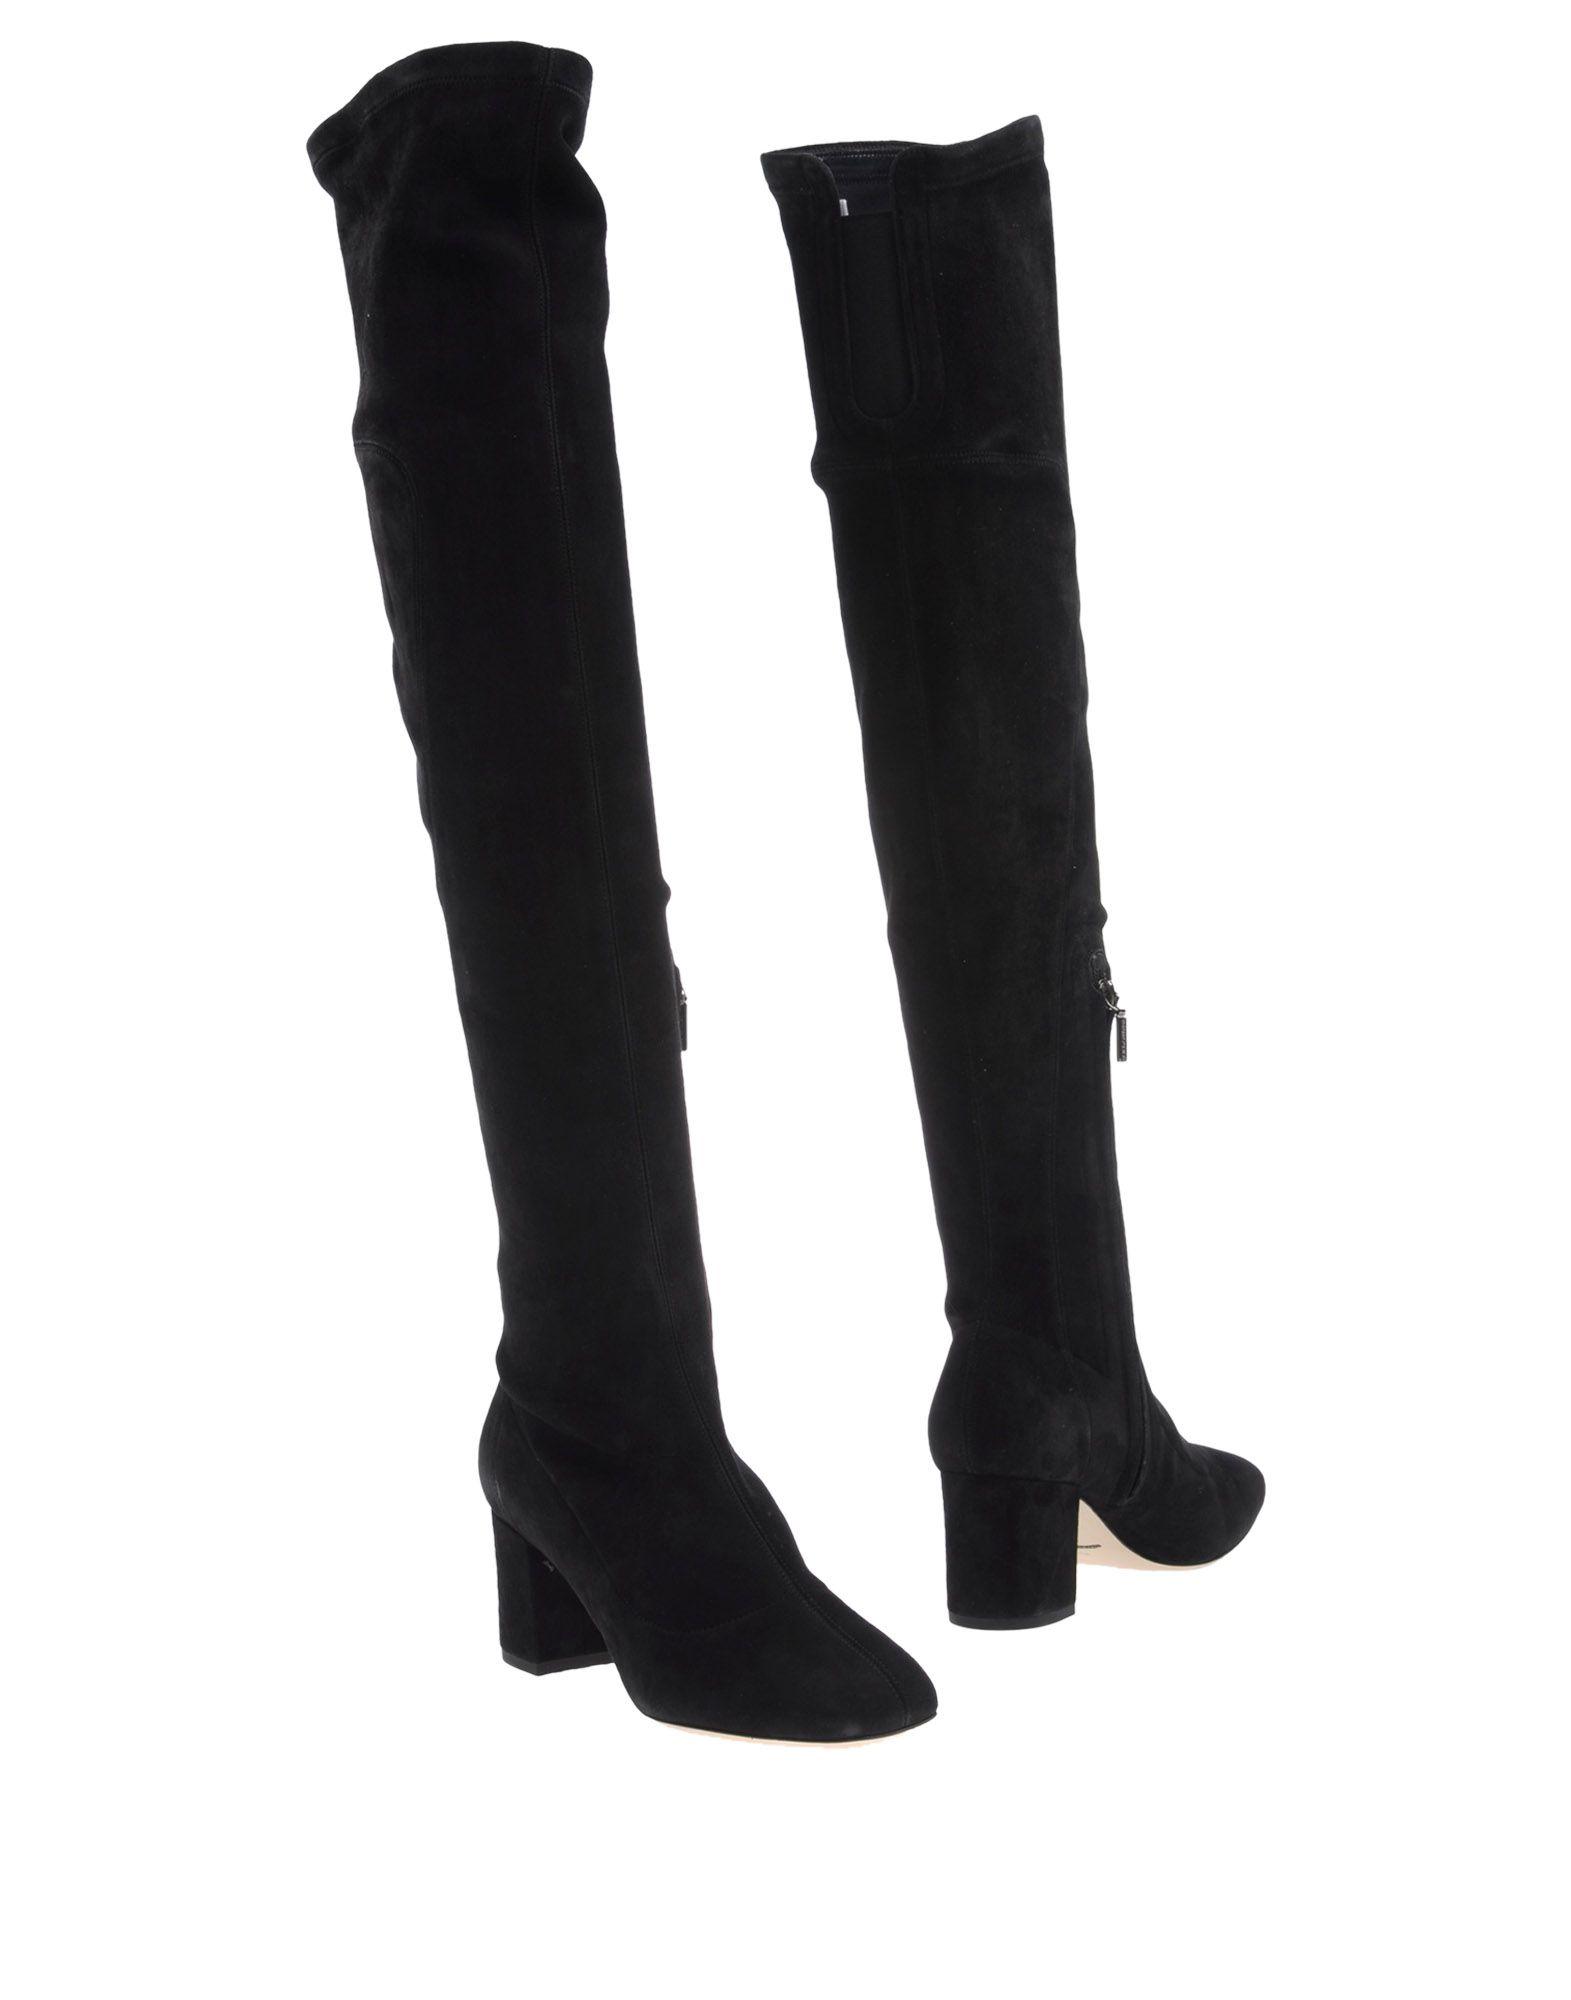 Dolce & Gabbana Boots - Women Dolce on & Gabbana Boots online on Dolce  United Kingdom - 11220461LH ece0eb